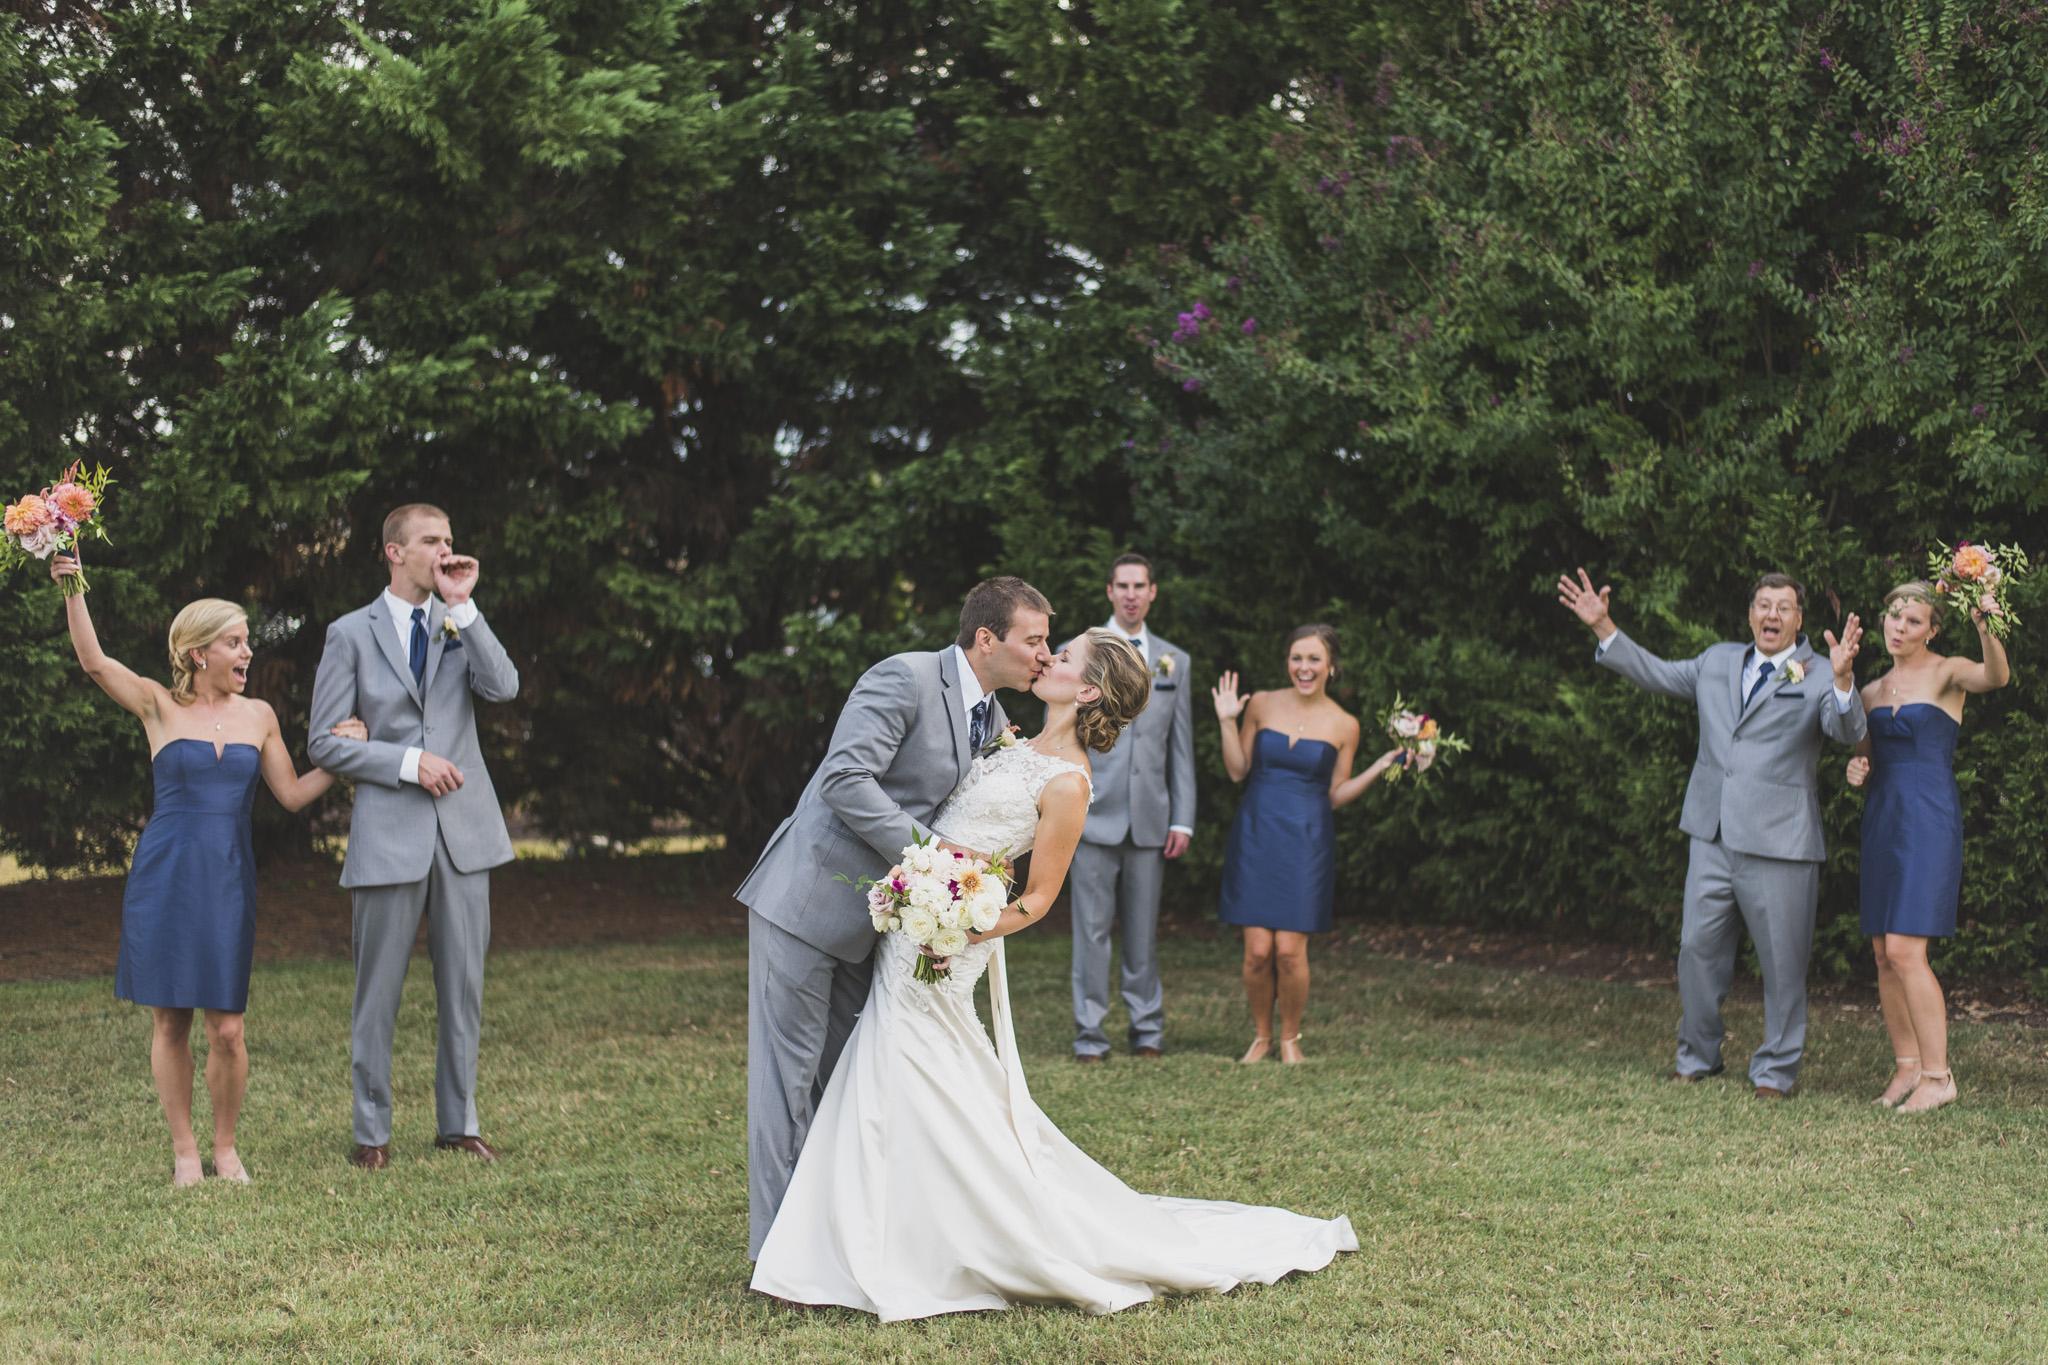 West Manor Wedding_Lynchburg VA_Classic_Black tie_Forest VA_Wedding_photos2066.jpg